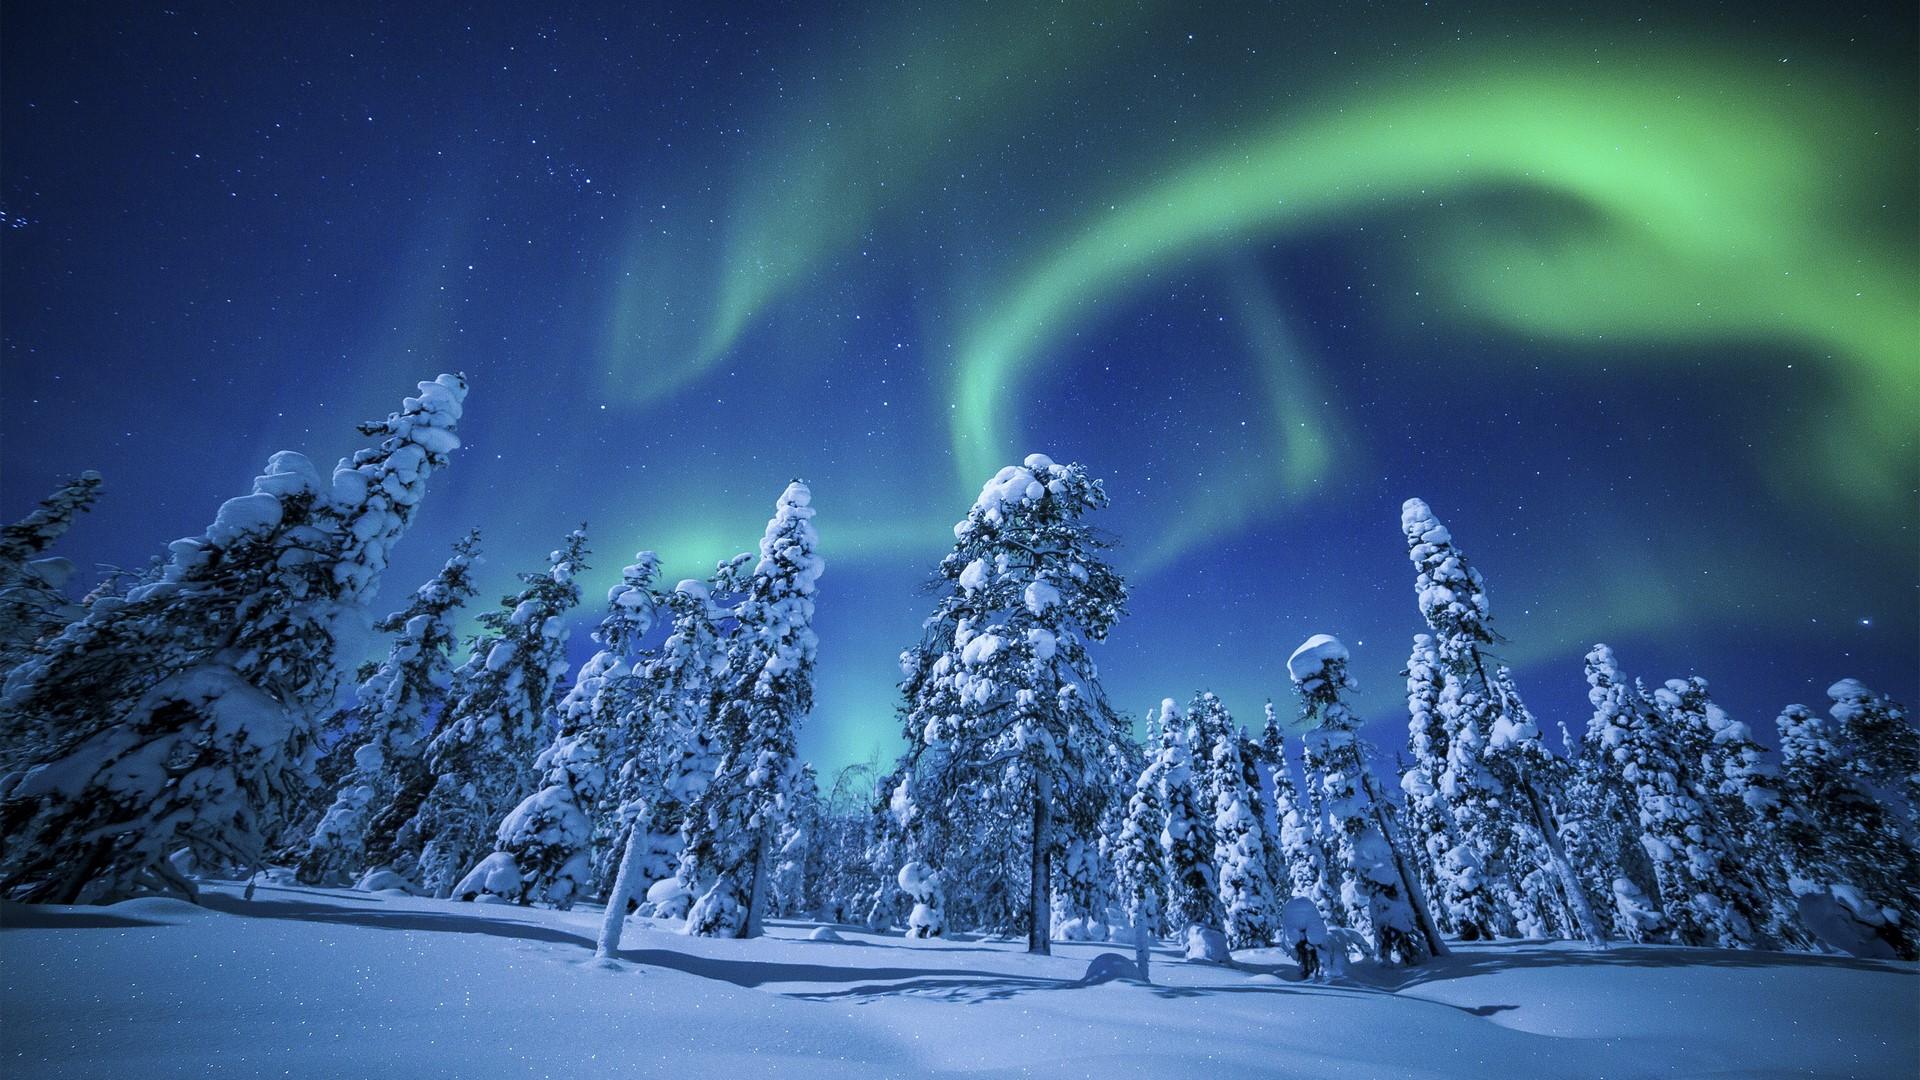 Aurora boreal as